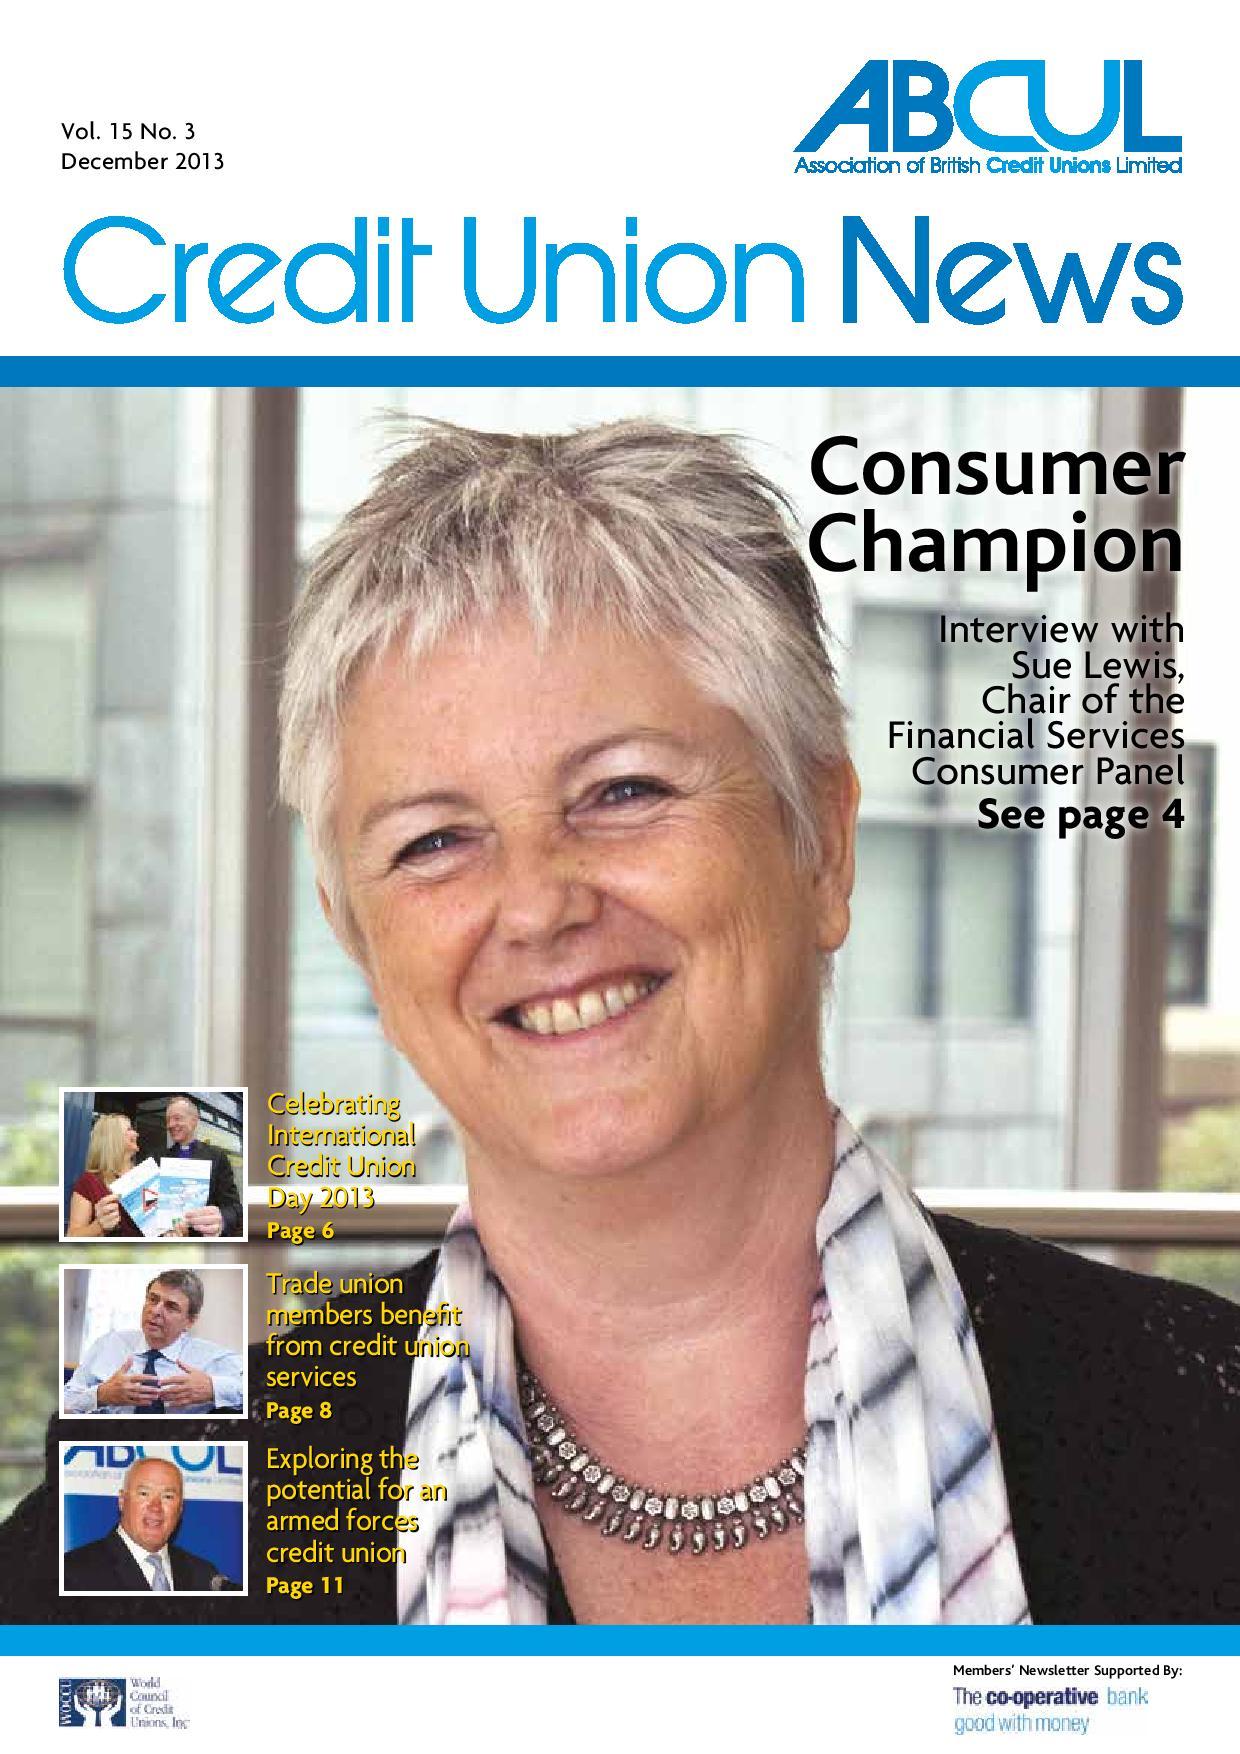 Credit Union News - December 2013